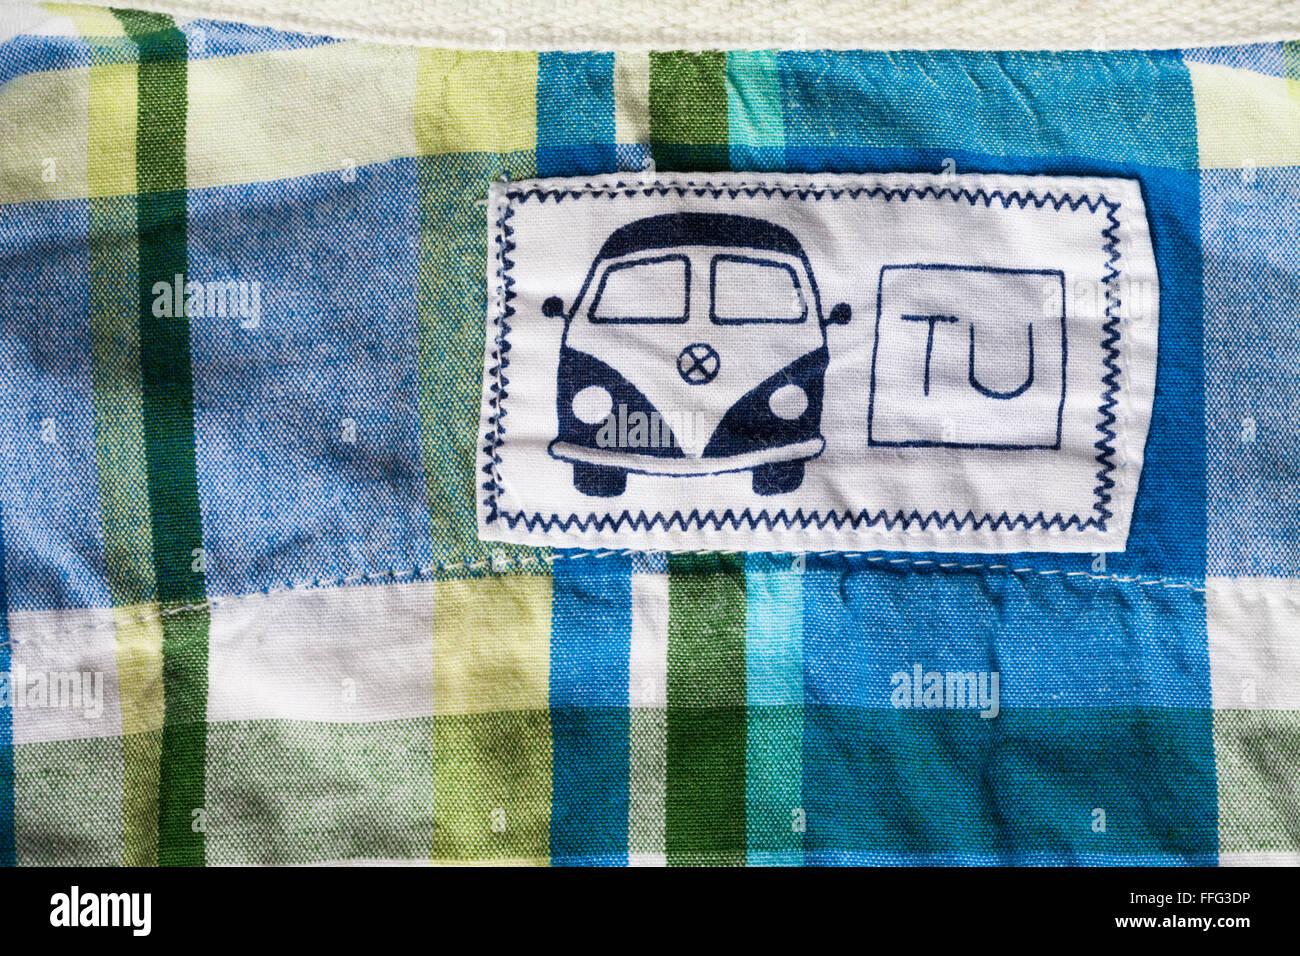 TU campervan label in toddlers shirt - Stock Image